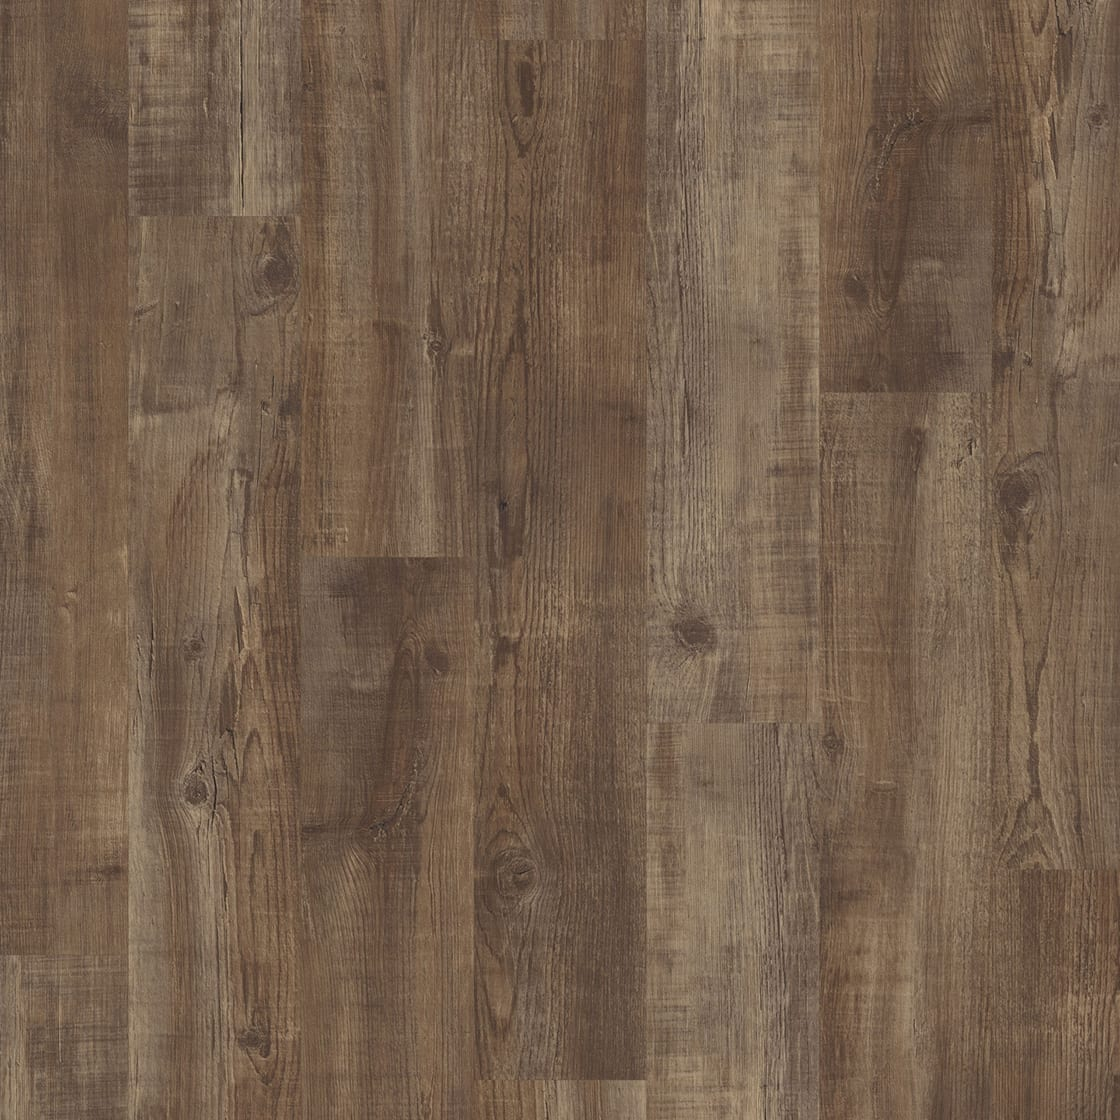 Karndean Knight Tile Wood Mckenzie Amp Willis